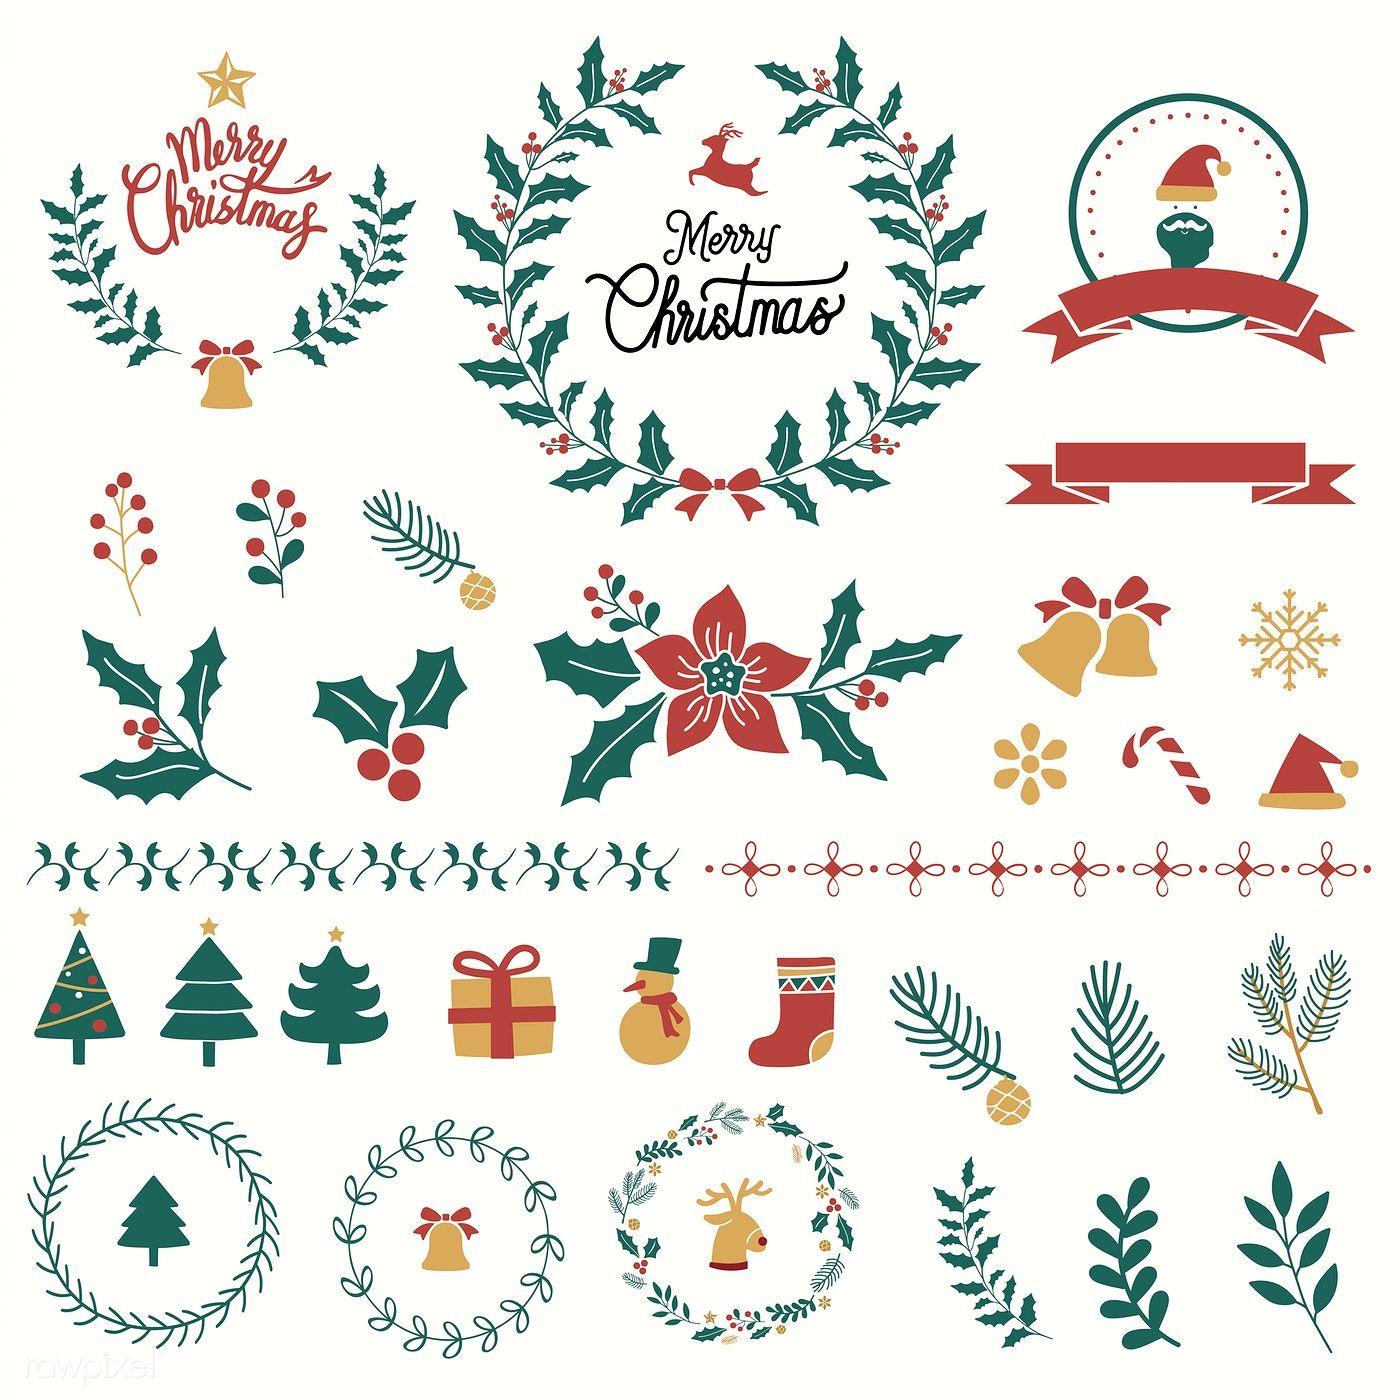 Download Premium Vector Of Illustration Set Of Christmas Decorations 494222 Christmas Illustration Christmas Vectors Christmas Design